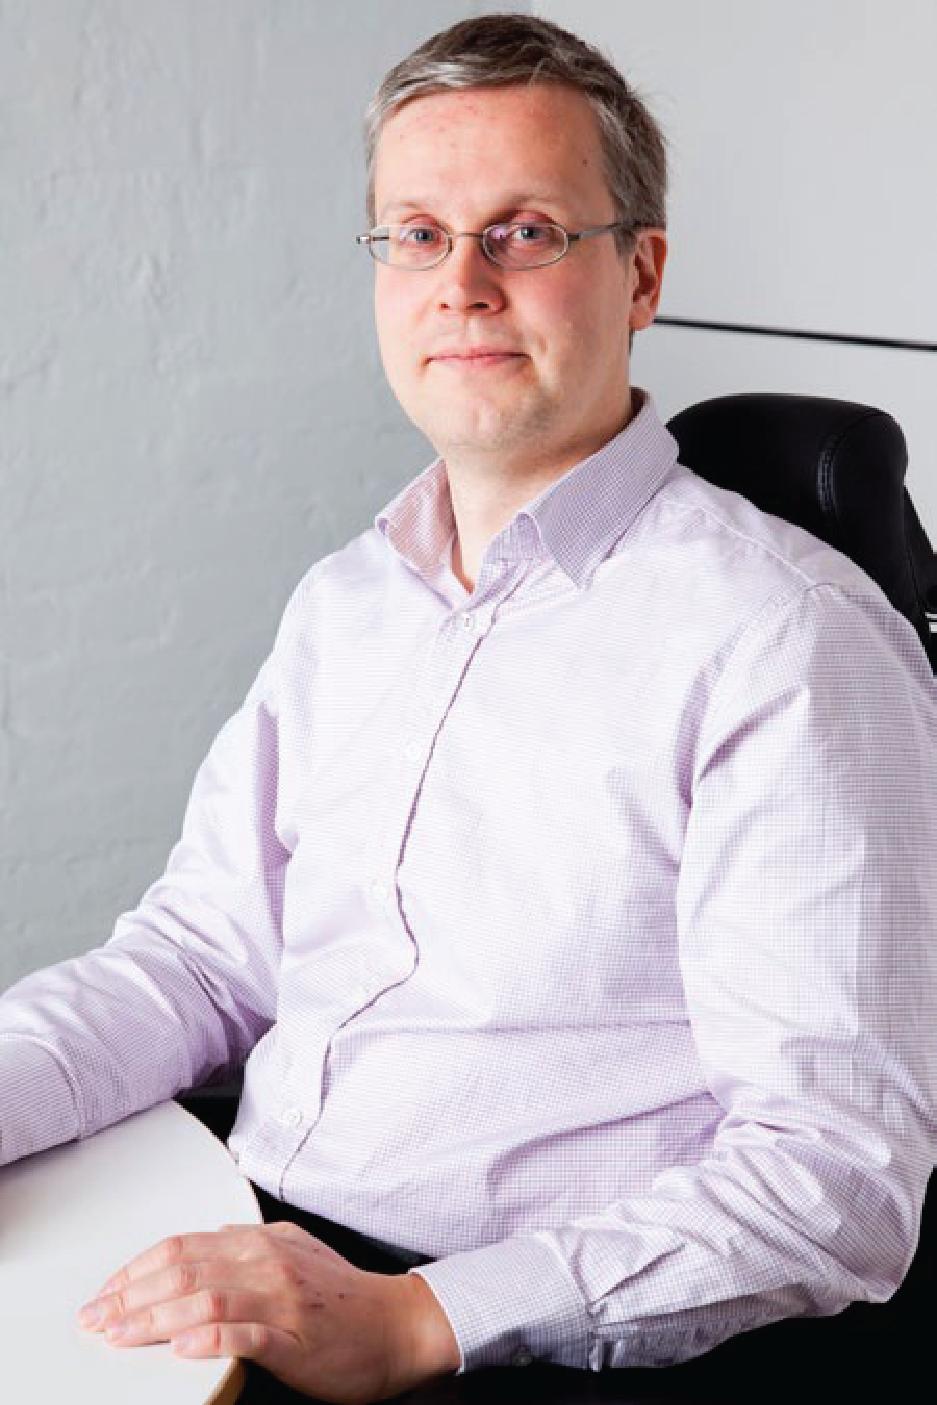 SSH inventor Tatu Ylönen